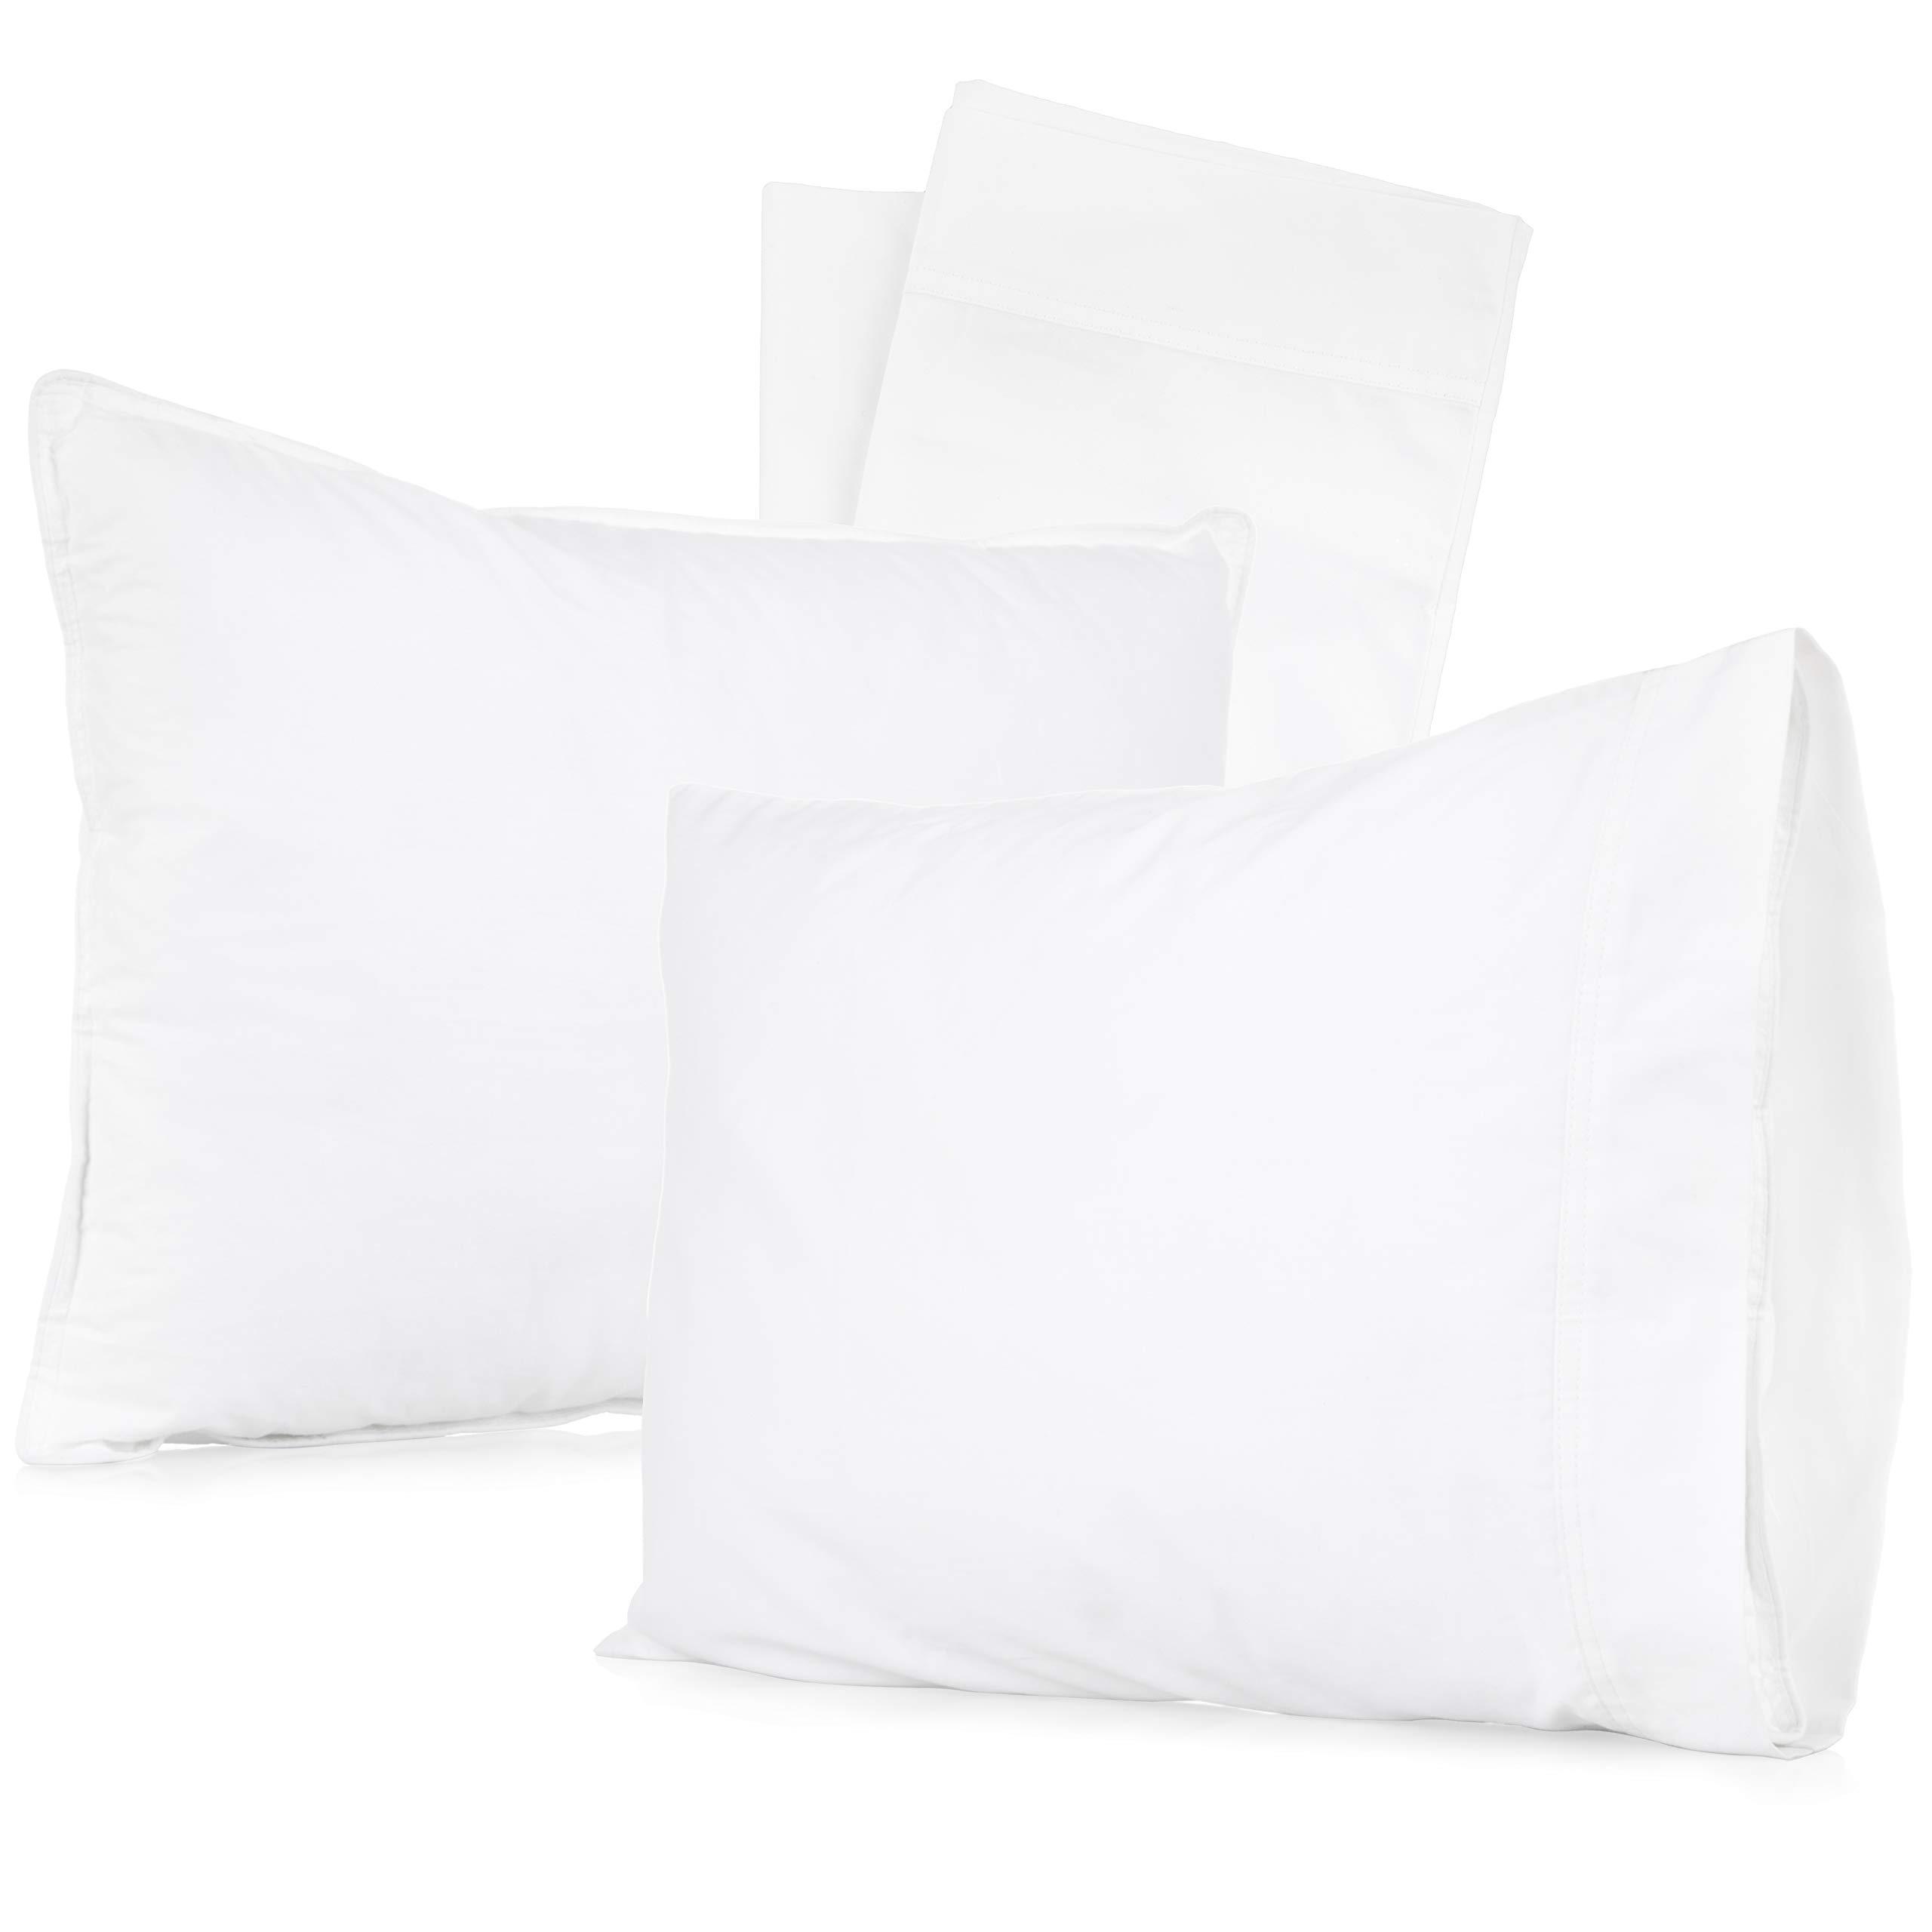 [4-Piece] 2 Pillows & 2 Pillowcases | Baby Toddler Pillows with Pillowcases | 13'' X 18'' Toddler Pillow Set | 100% Soft Organic Cotton | Zpex Baby Pillow & Pillowset by Zpex Baby Pillow